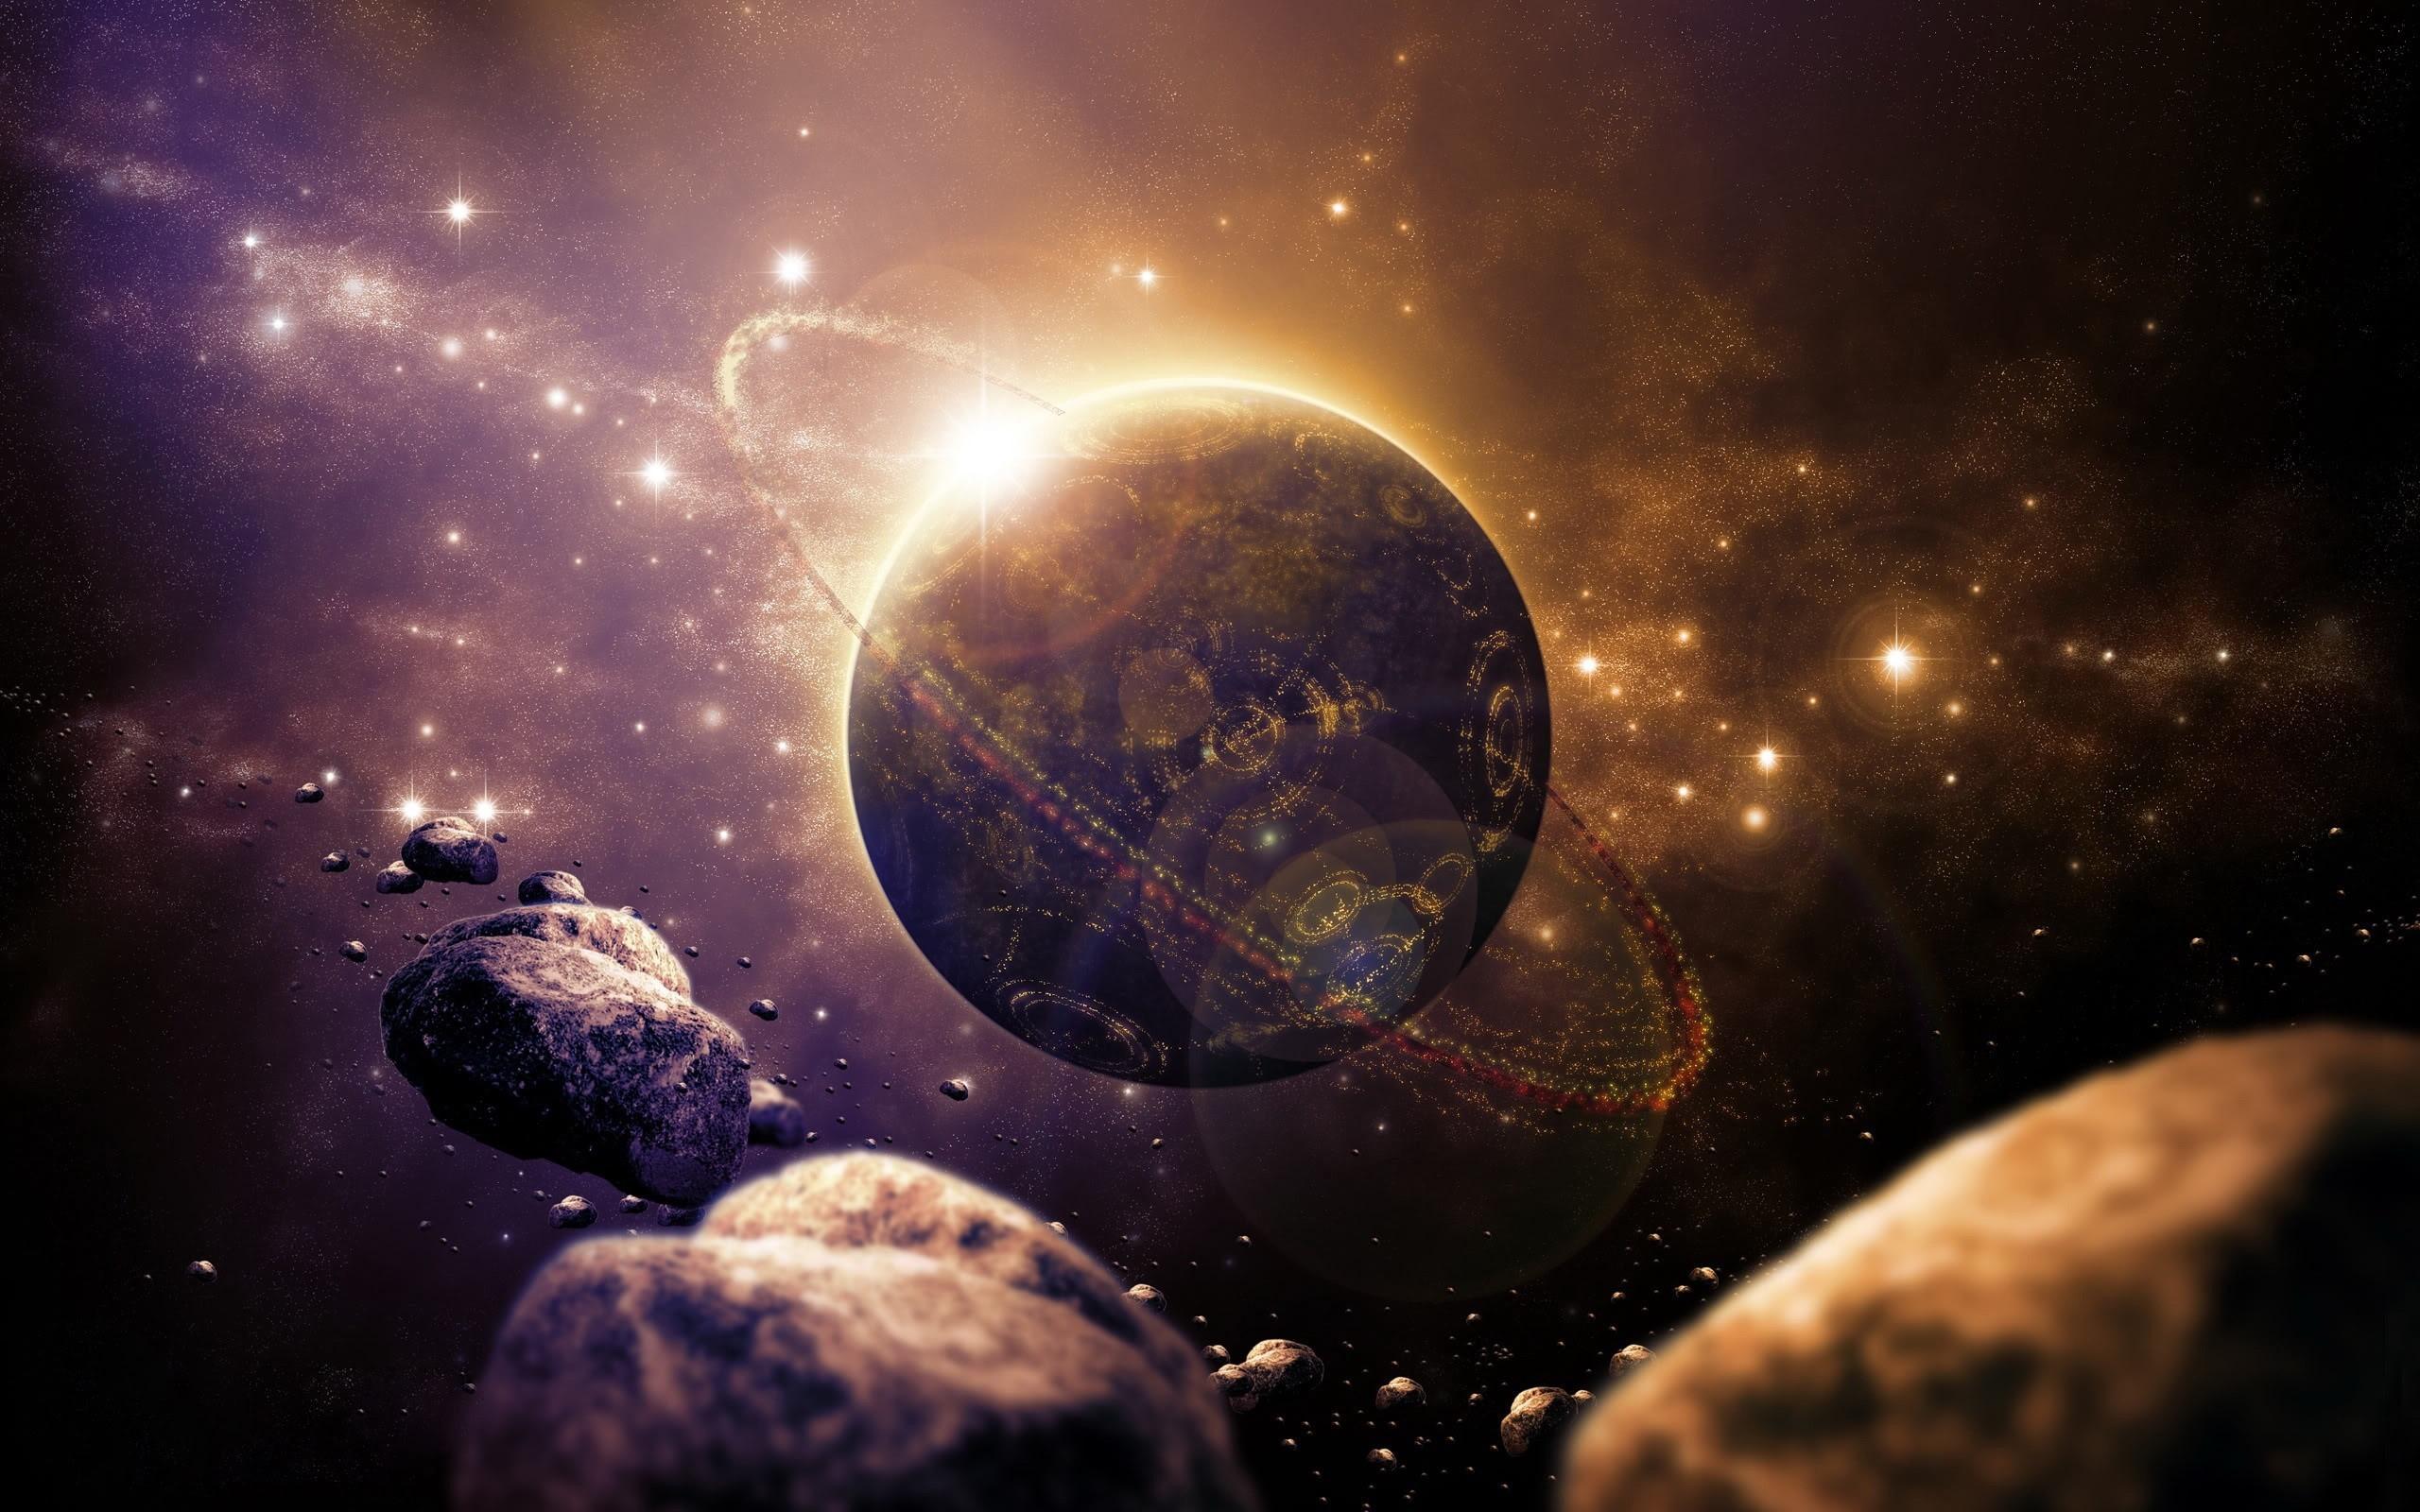 Sci fi Planet Wallpaper HD Wallpapers 2560x1600